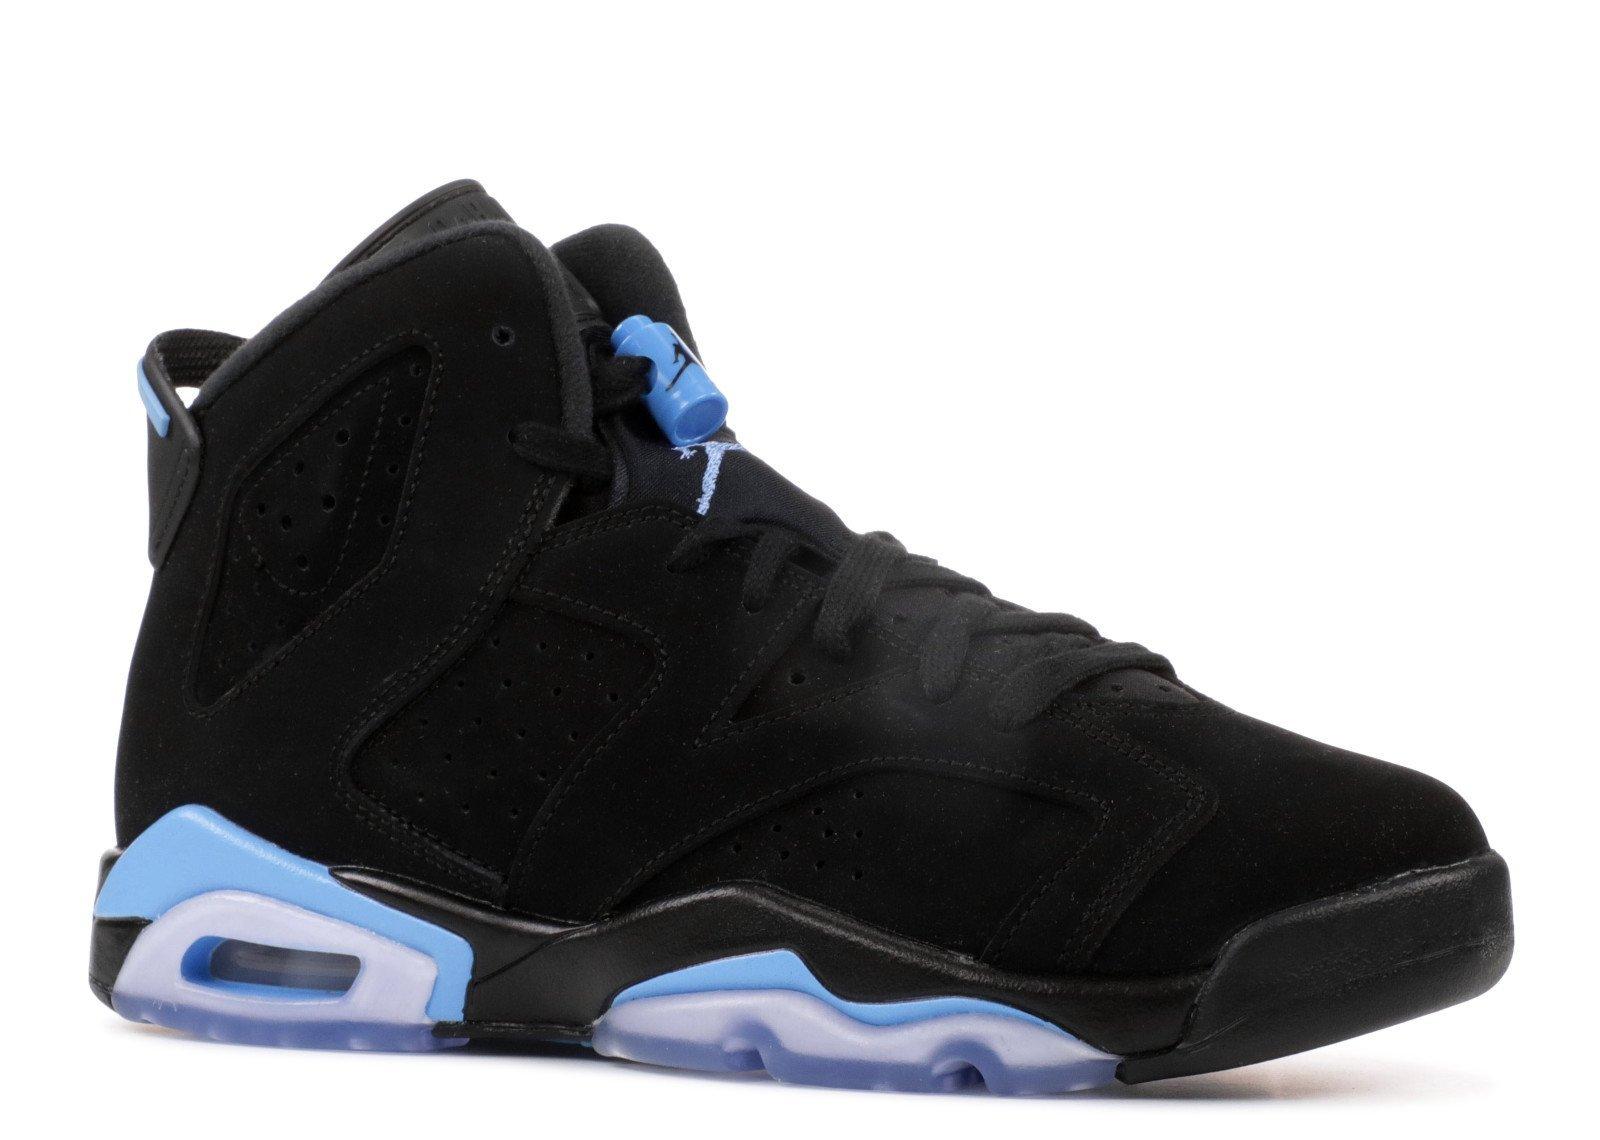 NIKE Air Jordan 6 Retro BG Kids Black/Blue 384665-006 (Size: 7Y)